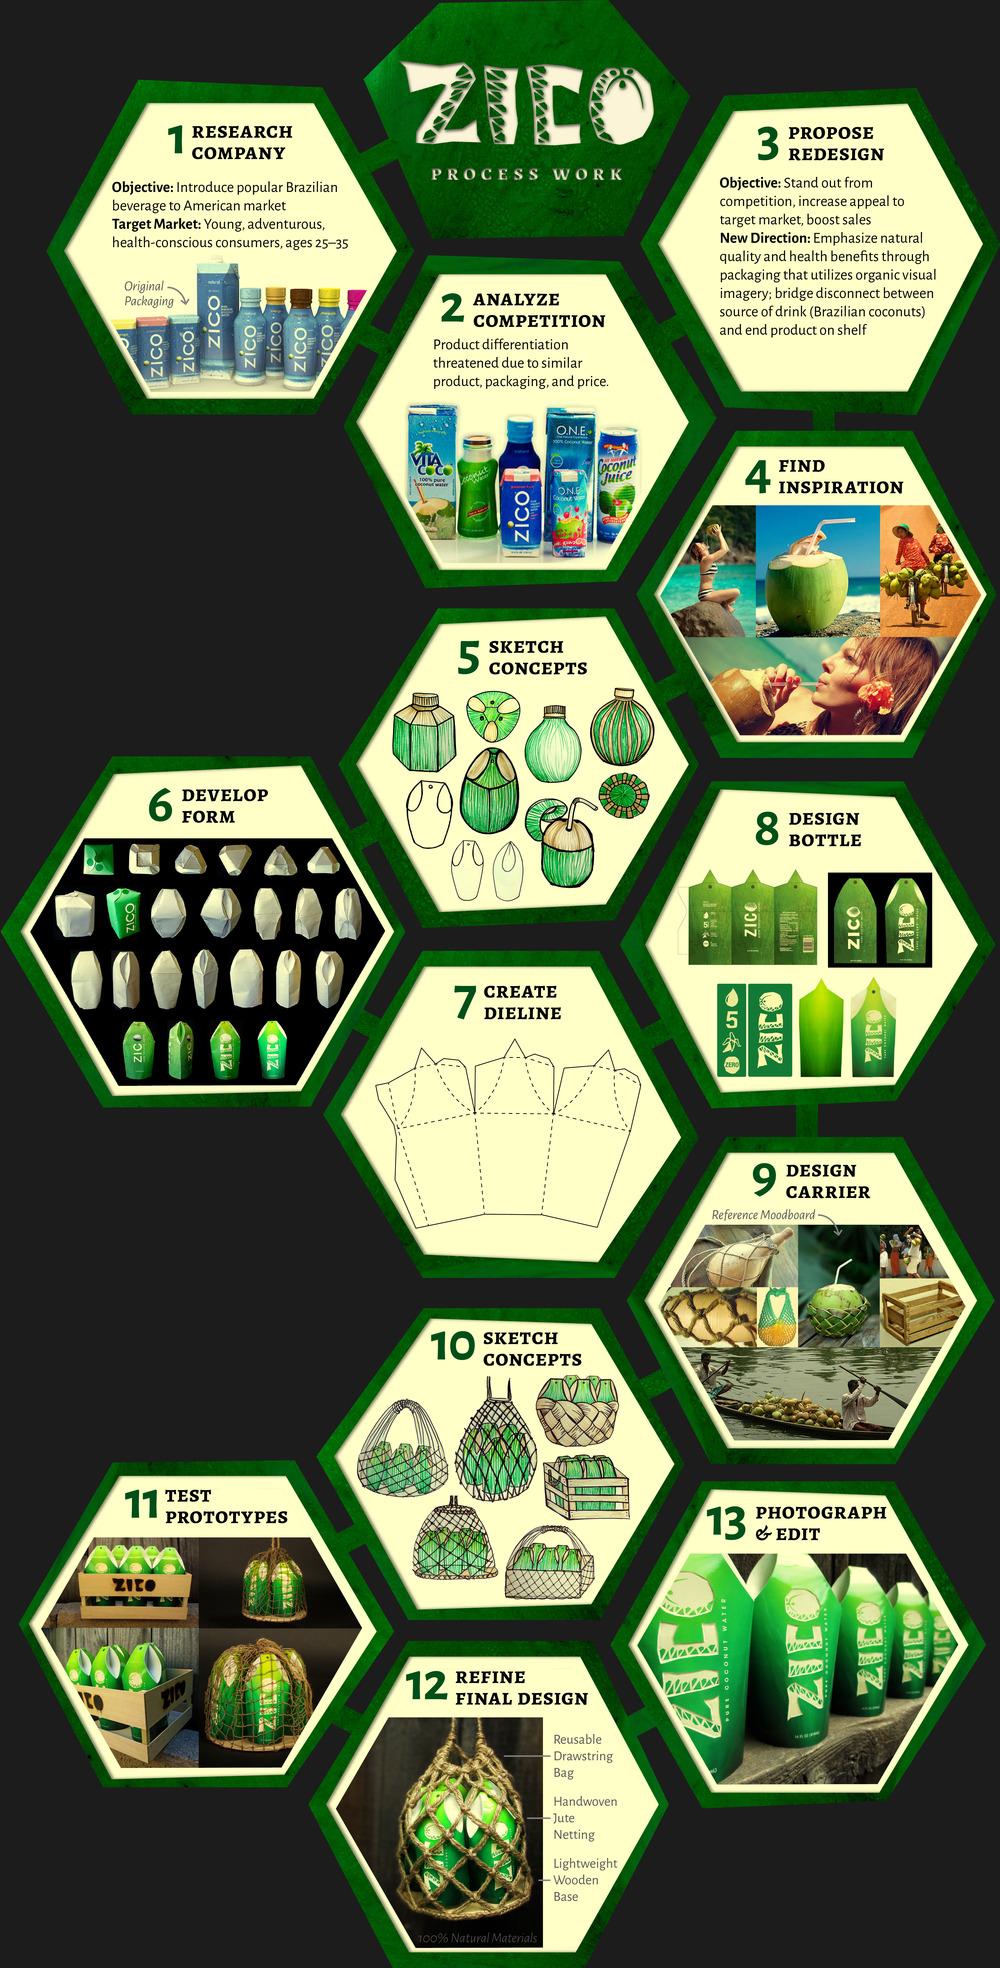 Zico Process Work